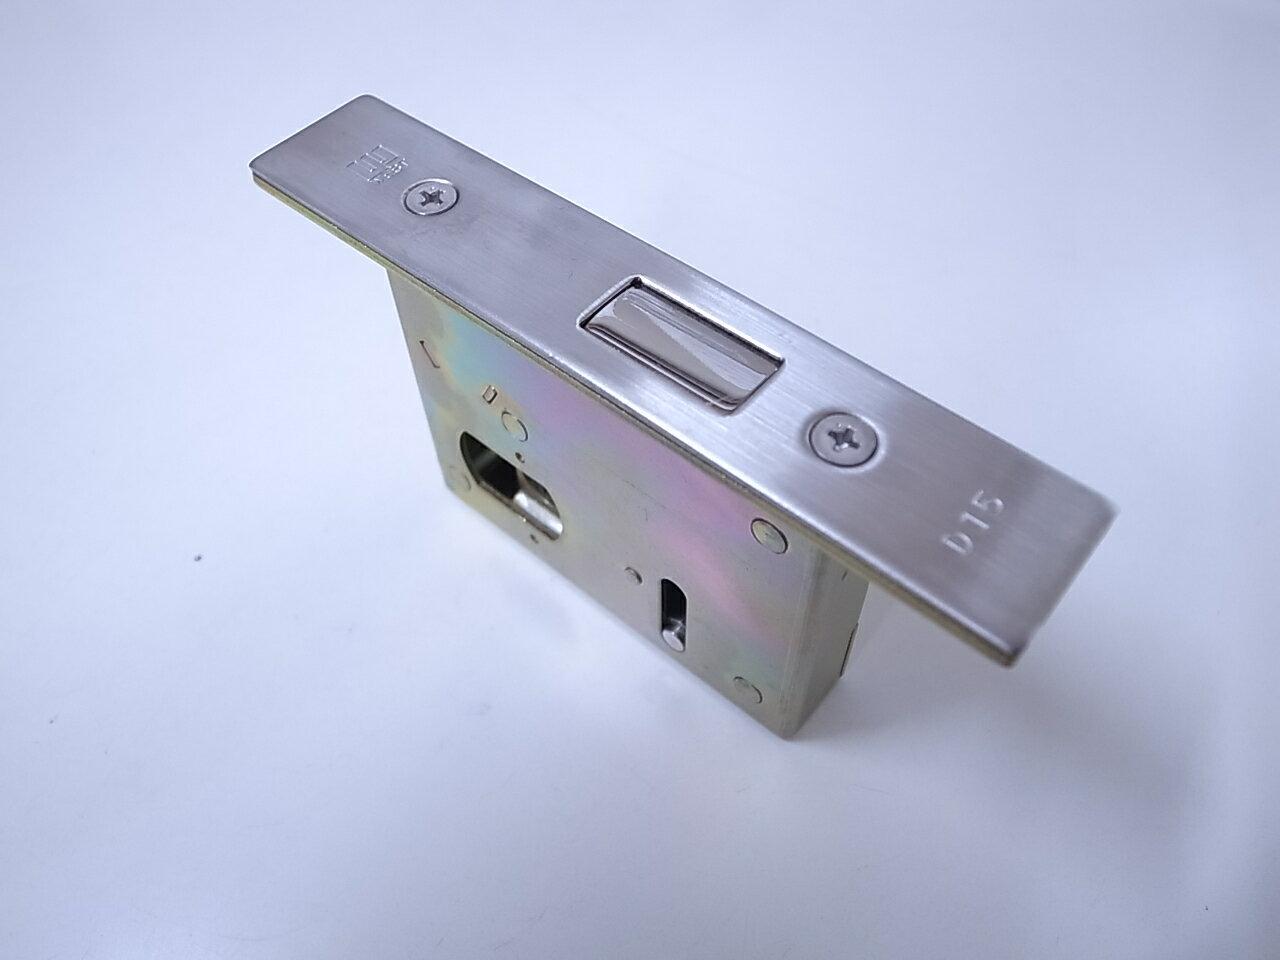 WEST D-15用錠ケースバックセット50ミリ 玄関 ドア 扉 修理 補修 交換 部品 パーツ